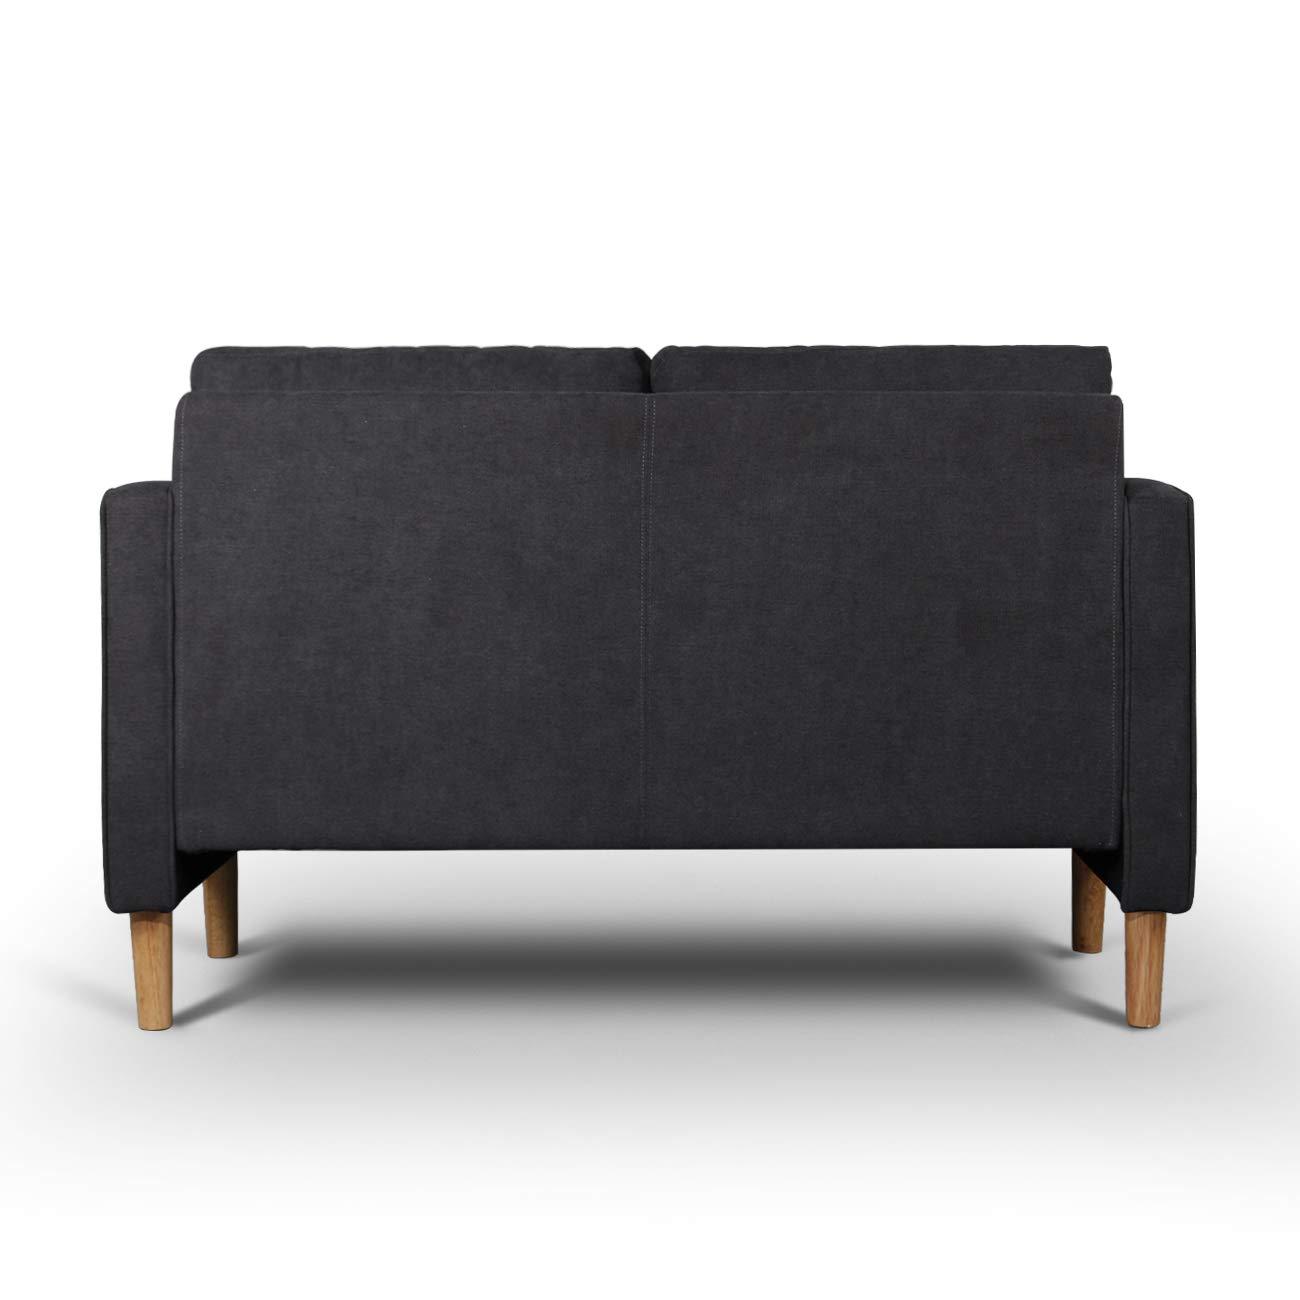 AODAILIHB Modern Soft Cloth Tufted Cushion Loveseat Sofa Small ...